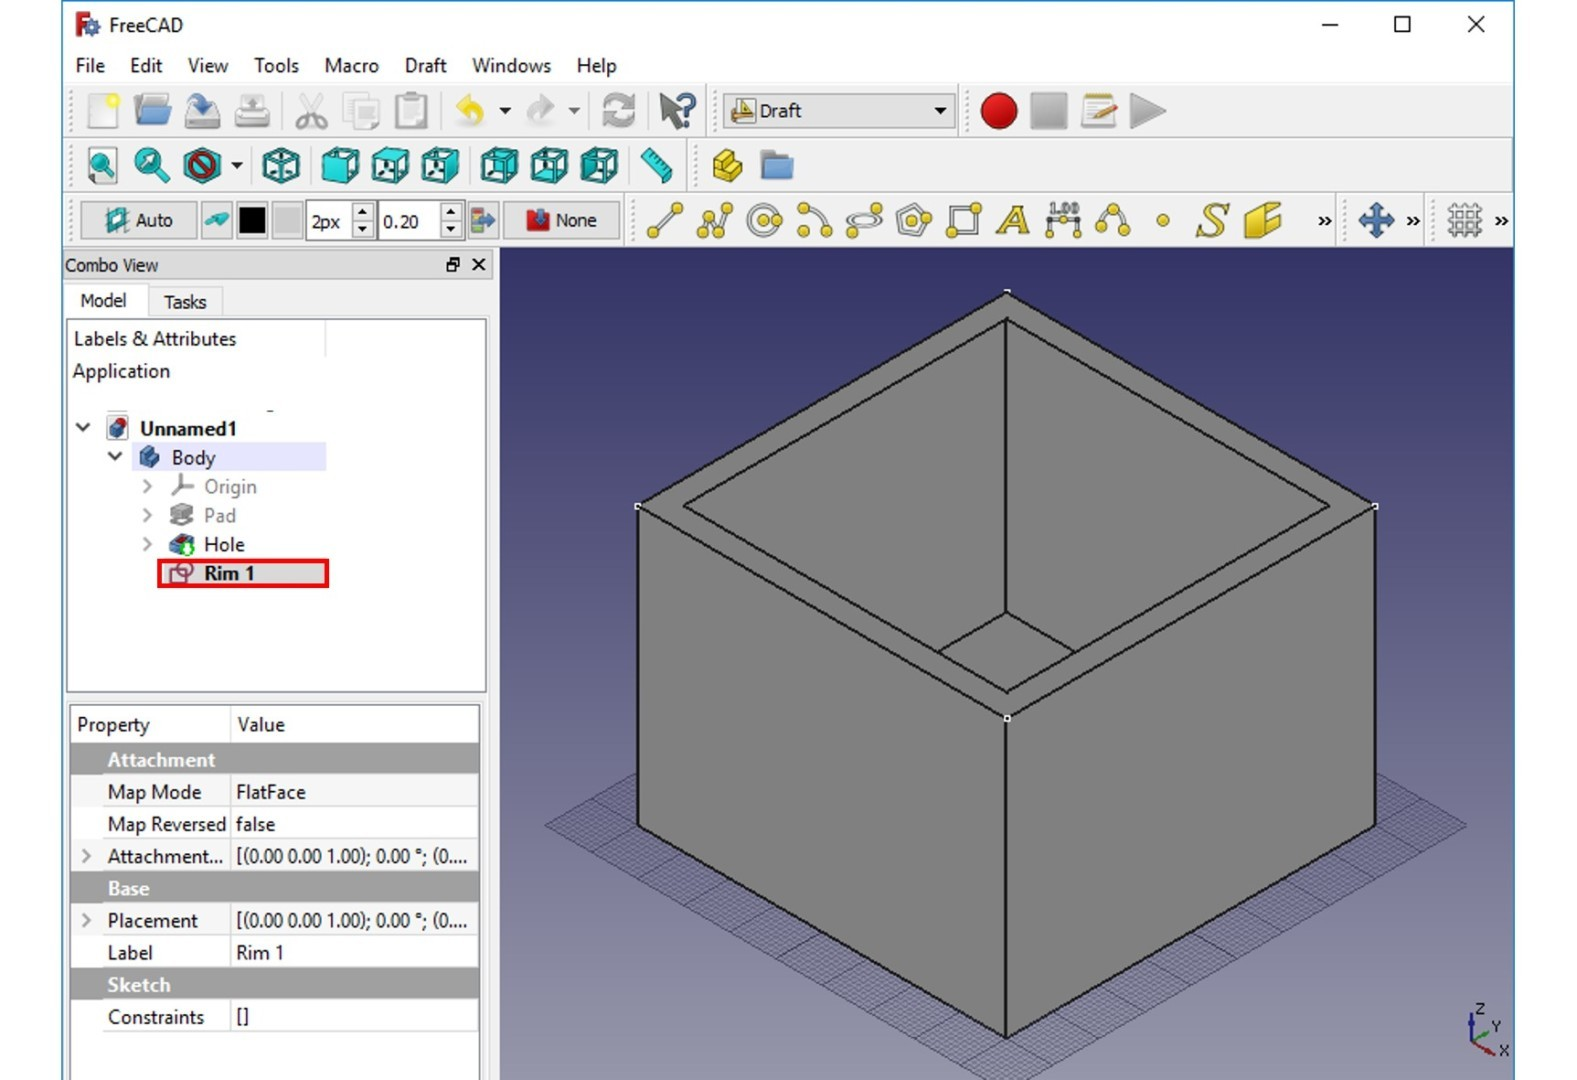 freecad tutorial rim ax view